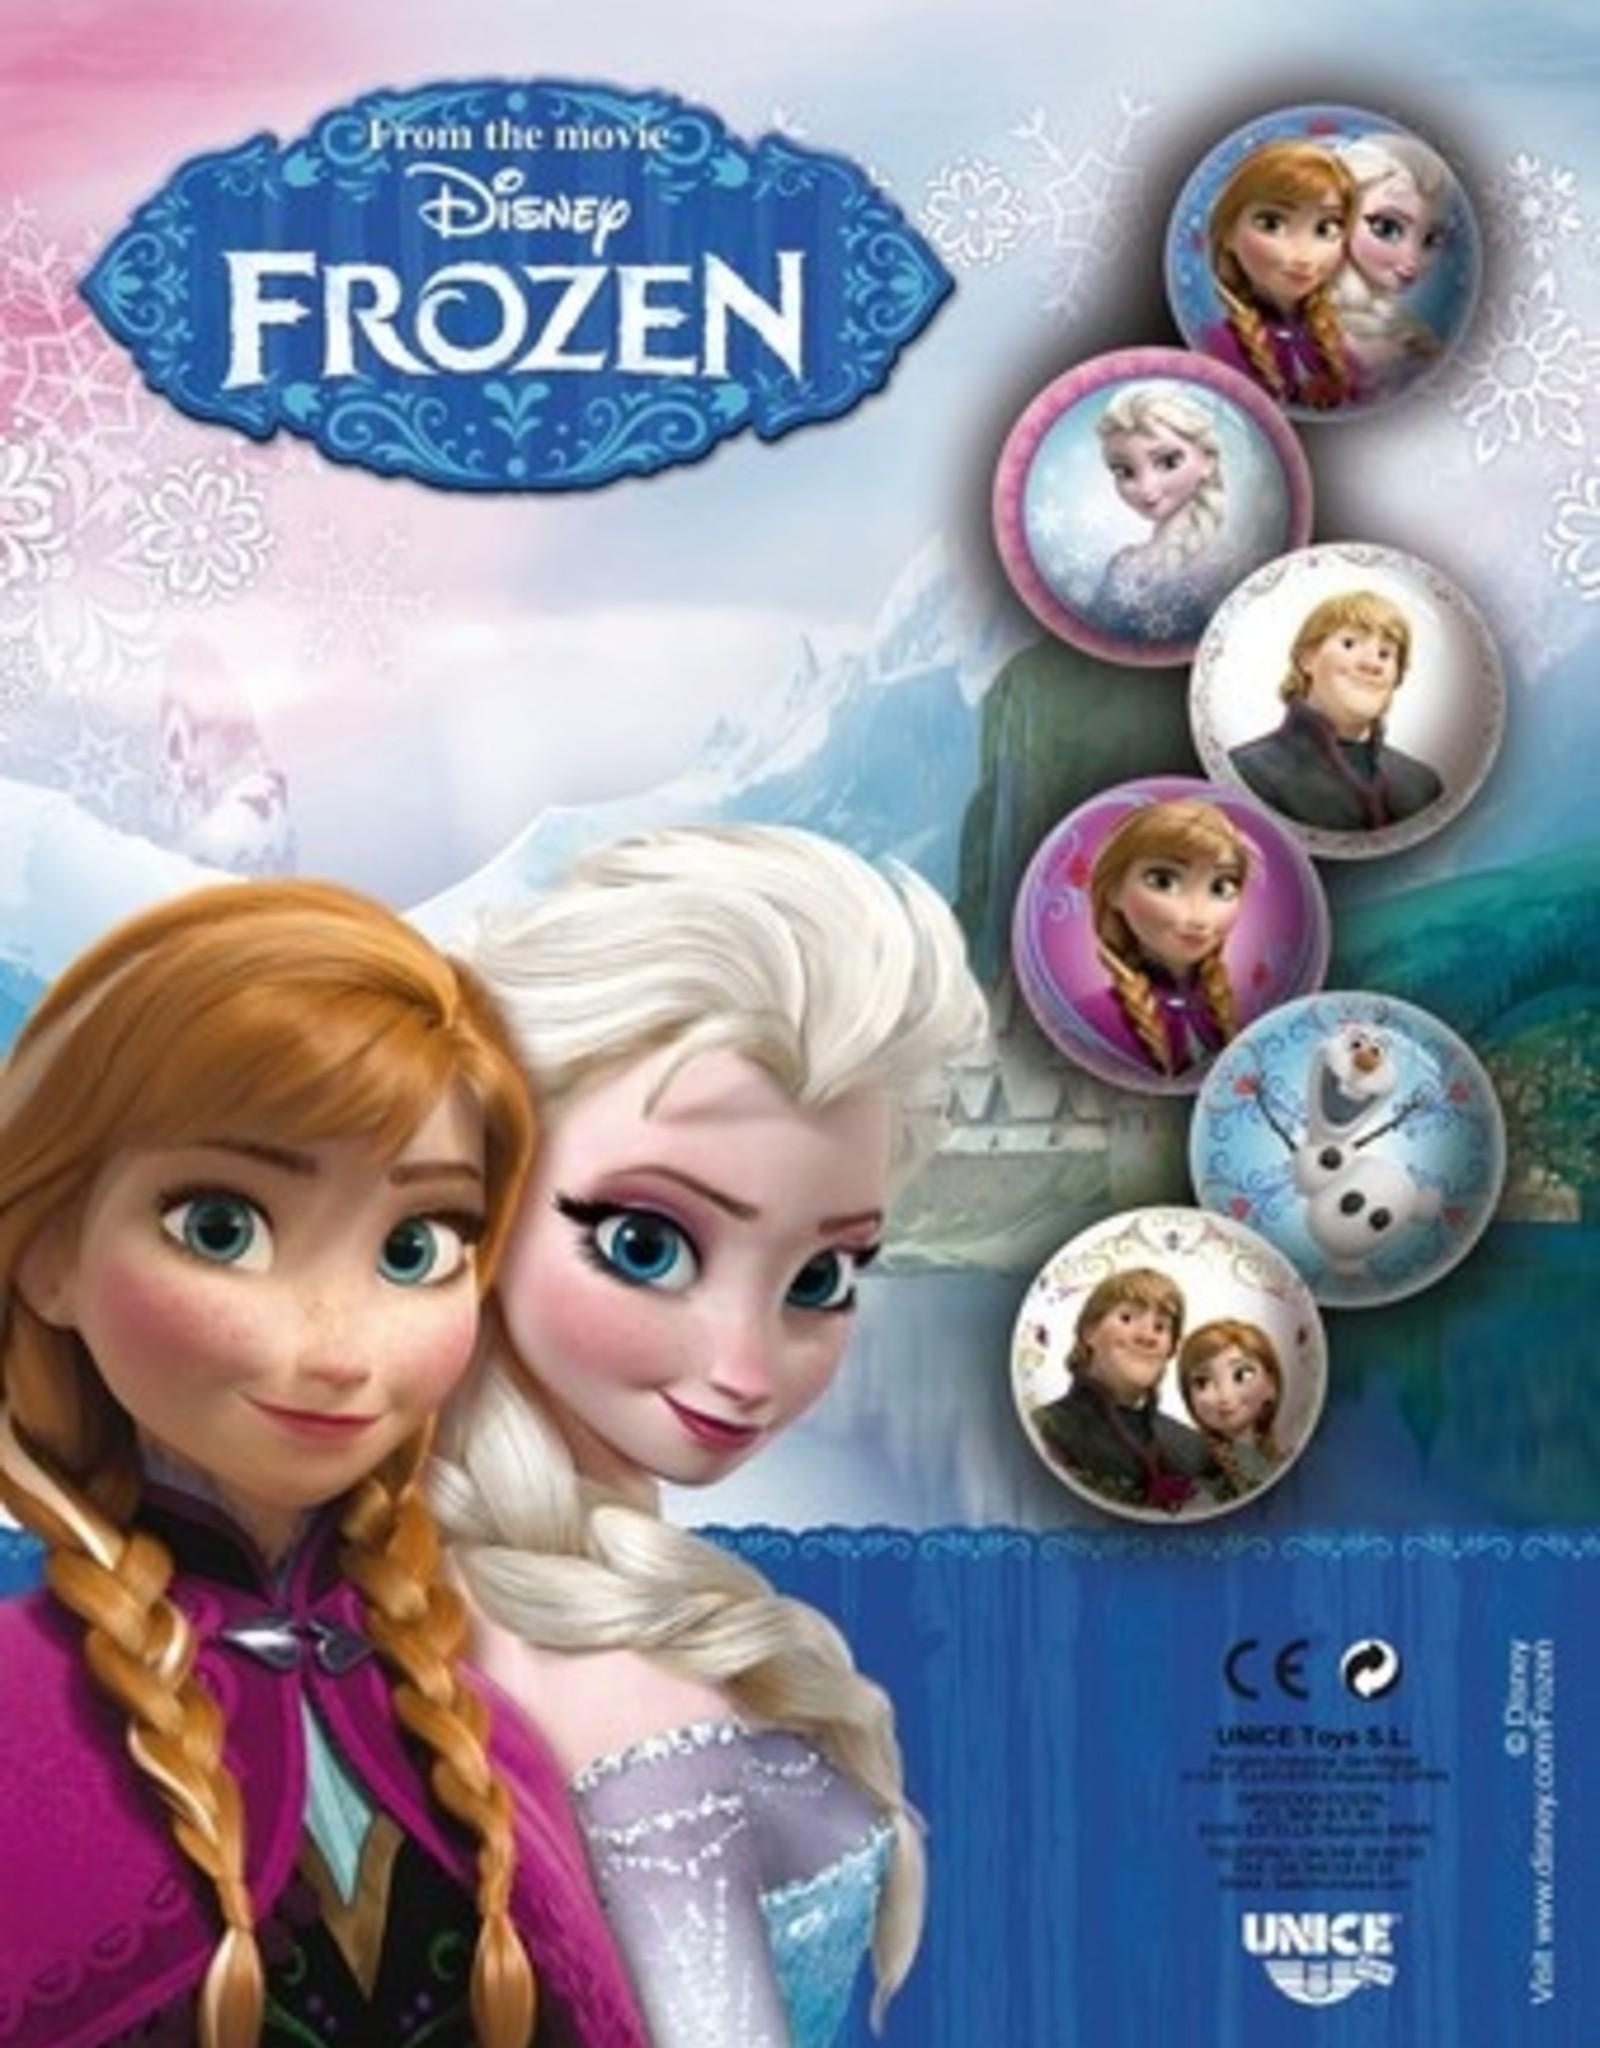 Frozen Frozen Tattoos